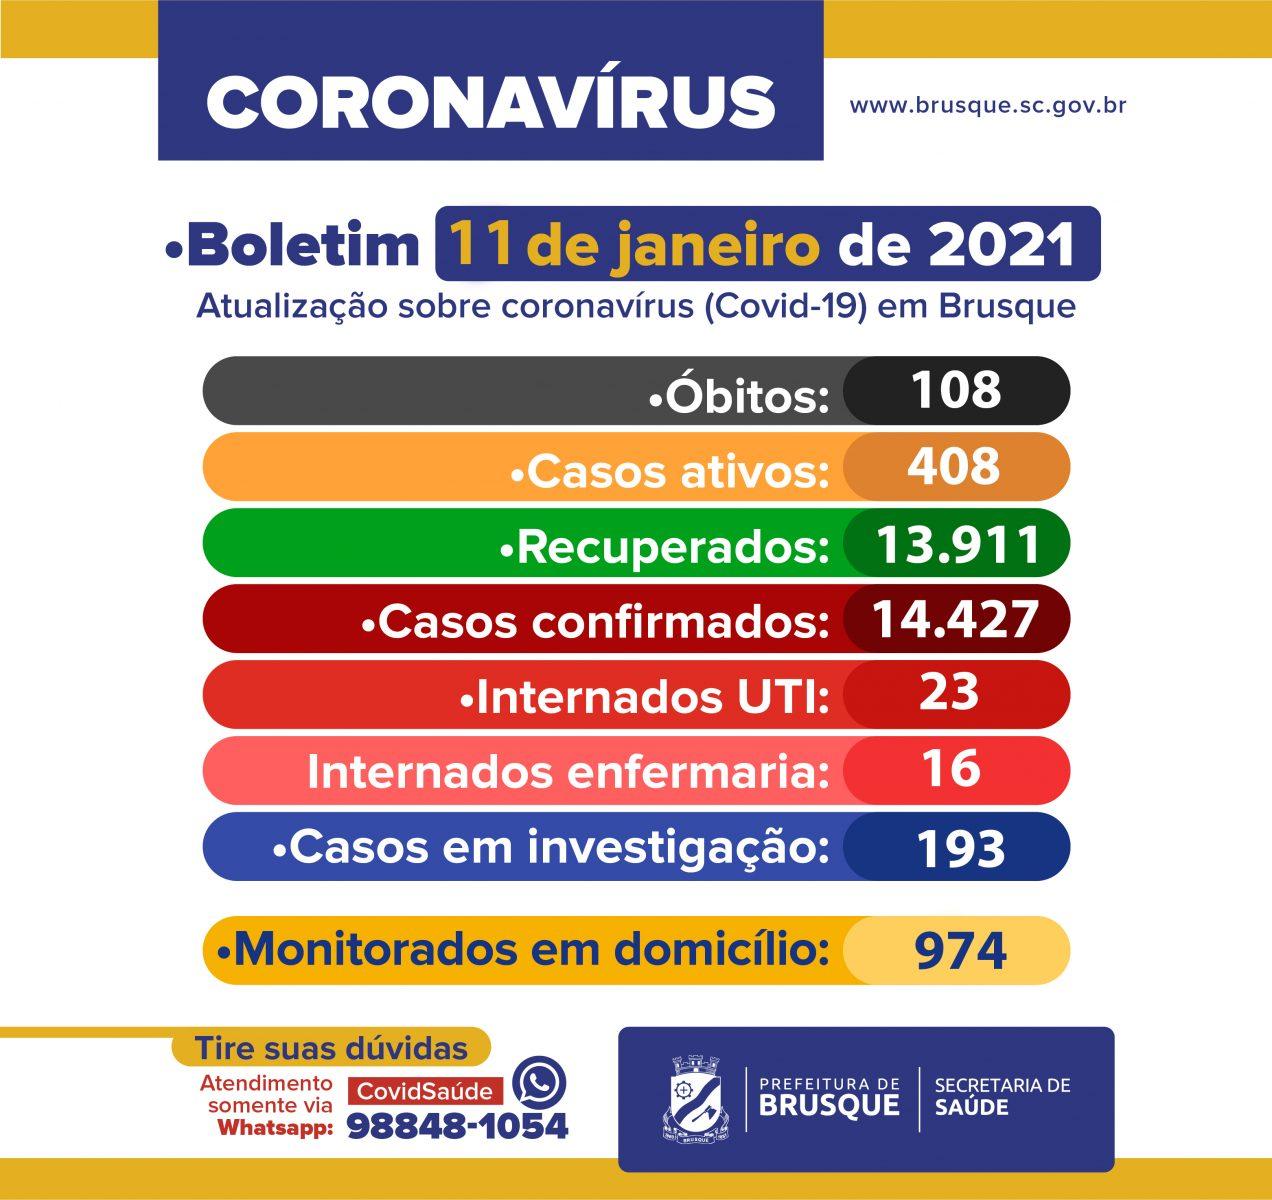 Covid-19: Confira o boletim epidemiológico desta segunda-feira (11)